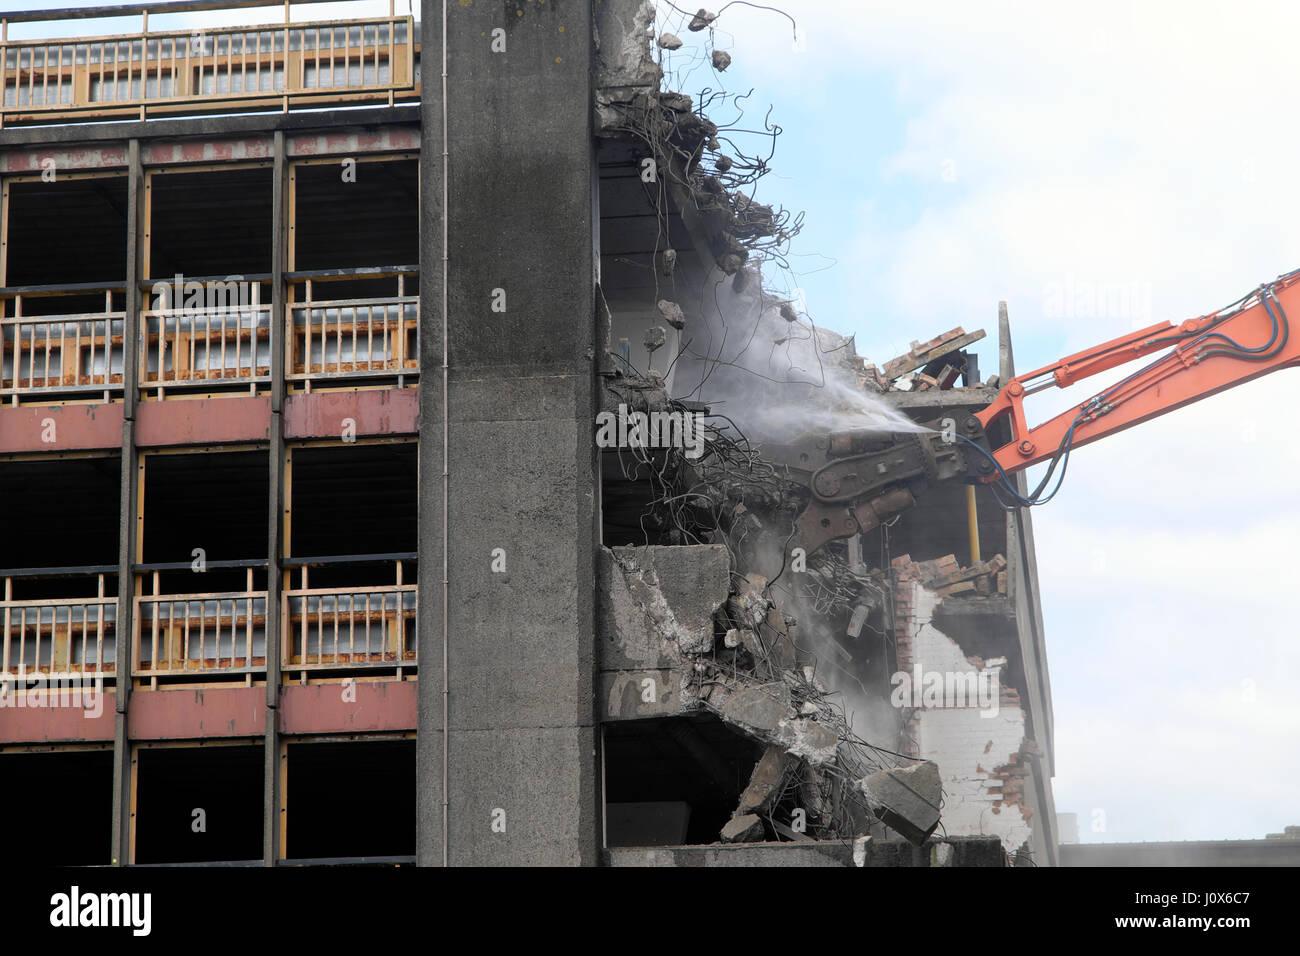 Spec excavator demolition of derelict buildings on construction site Wood St car park near Central Square, Cardiff Stock Photo